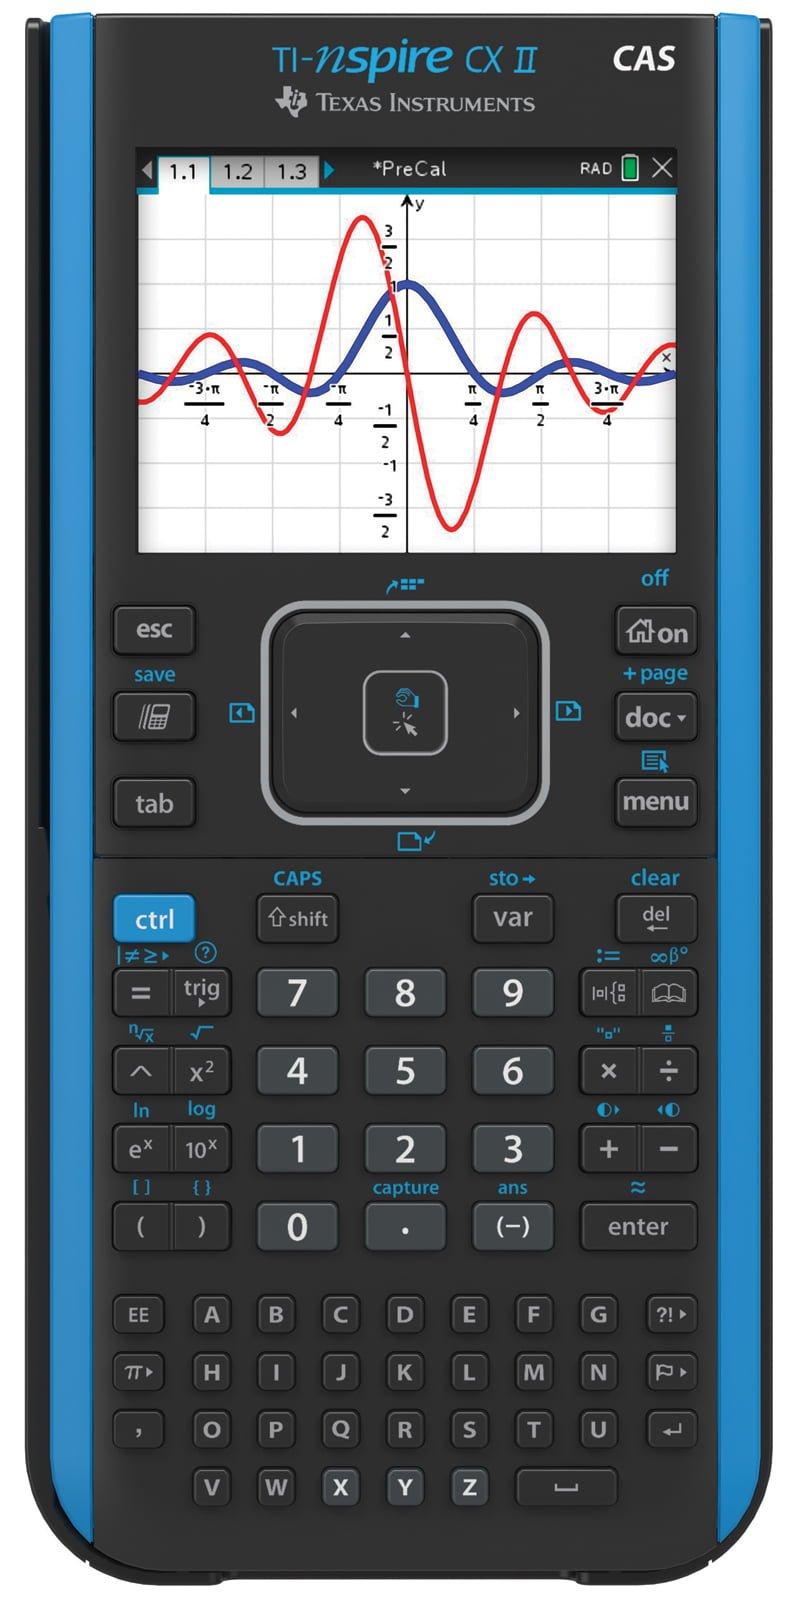 Texas Instruments TI-Nspire CX II CAS Handheld Graphing Calculator